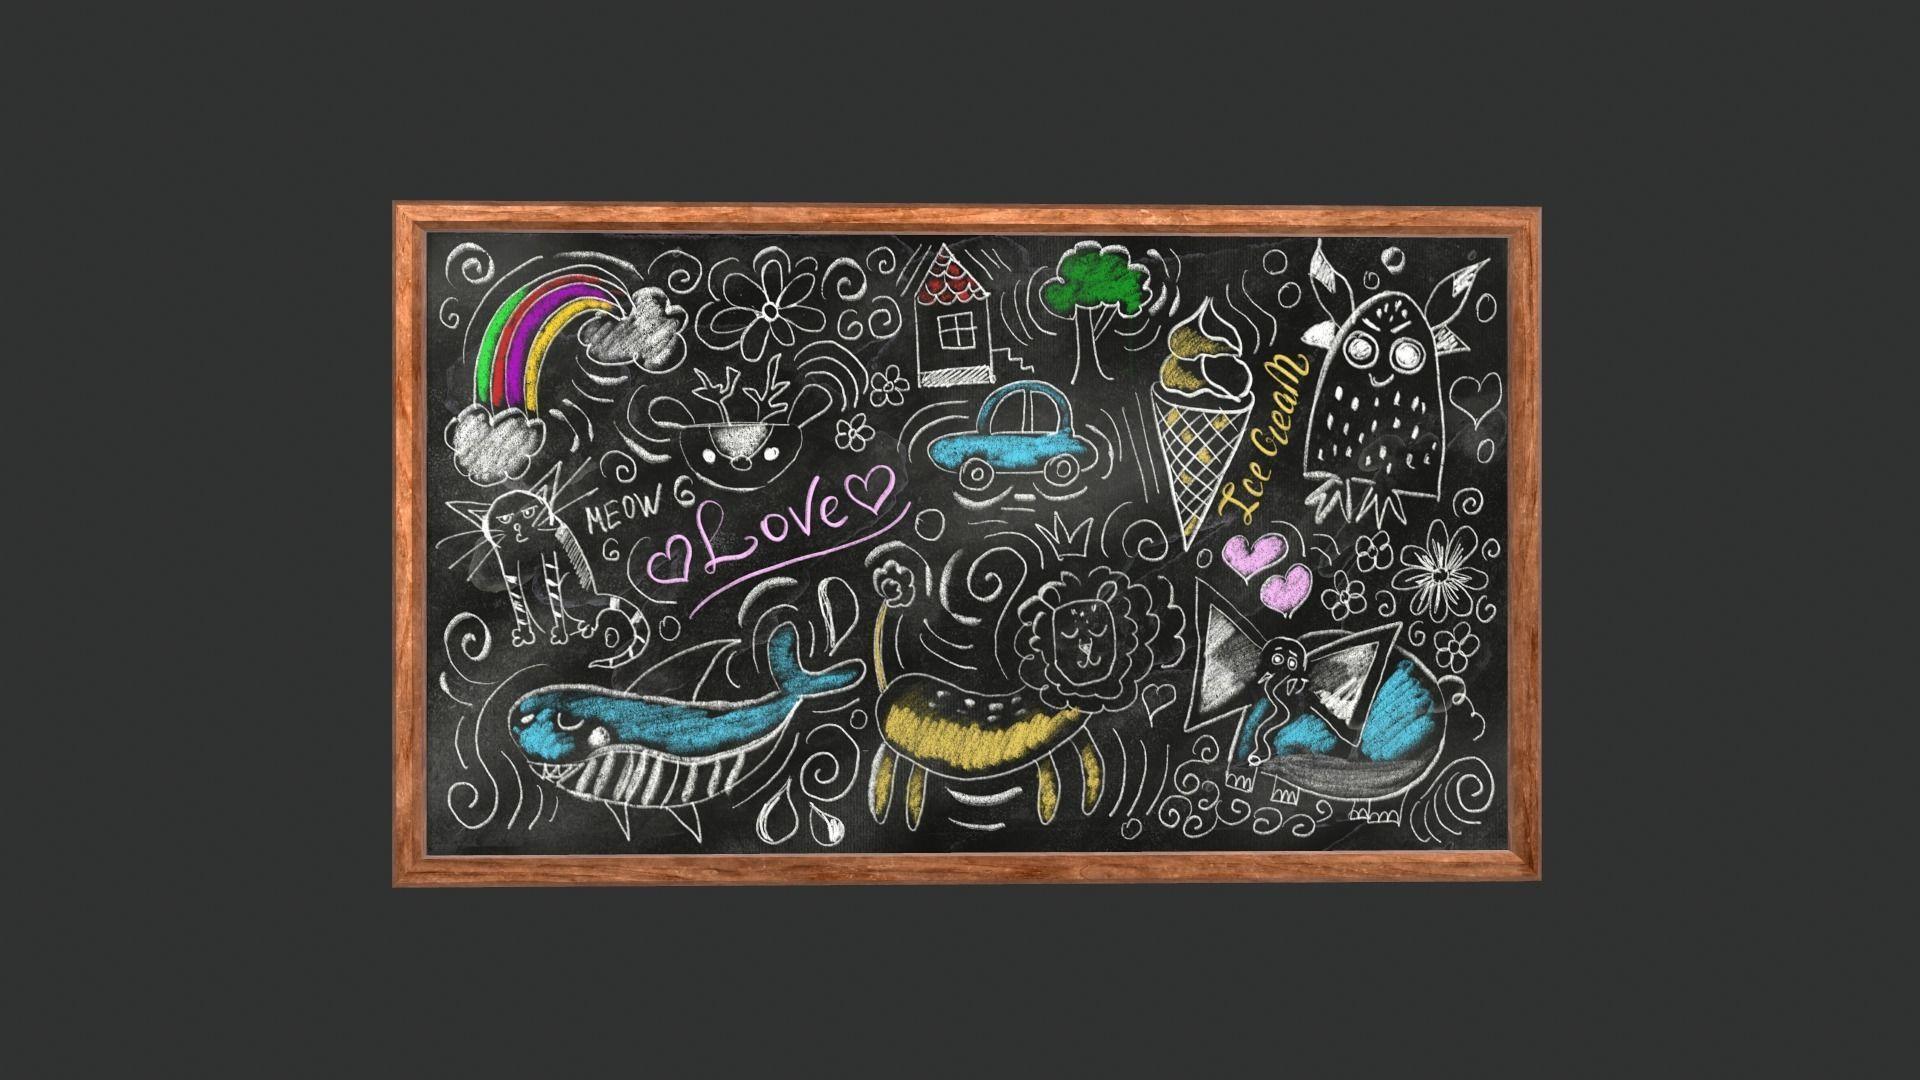 Funny Chalkboard Game Ready